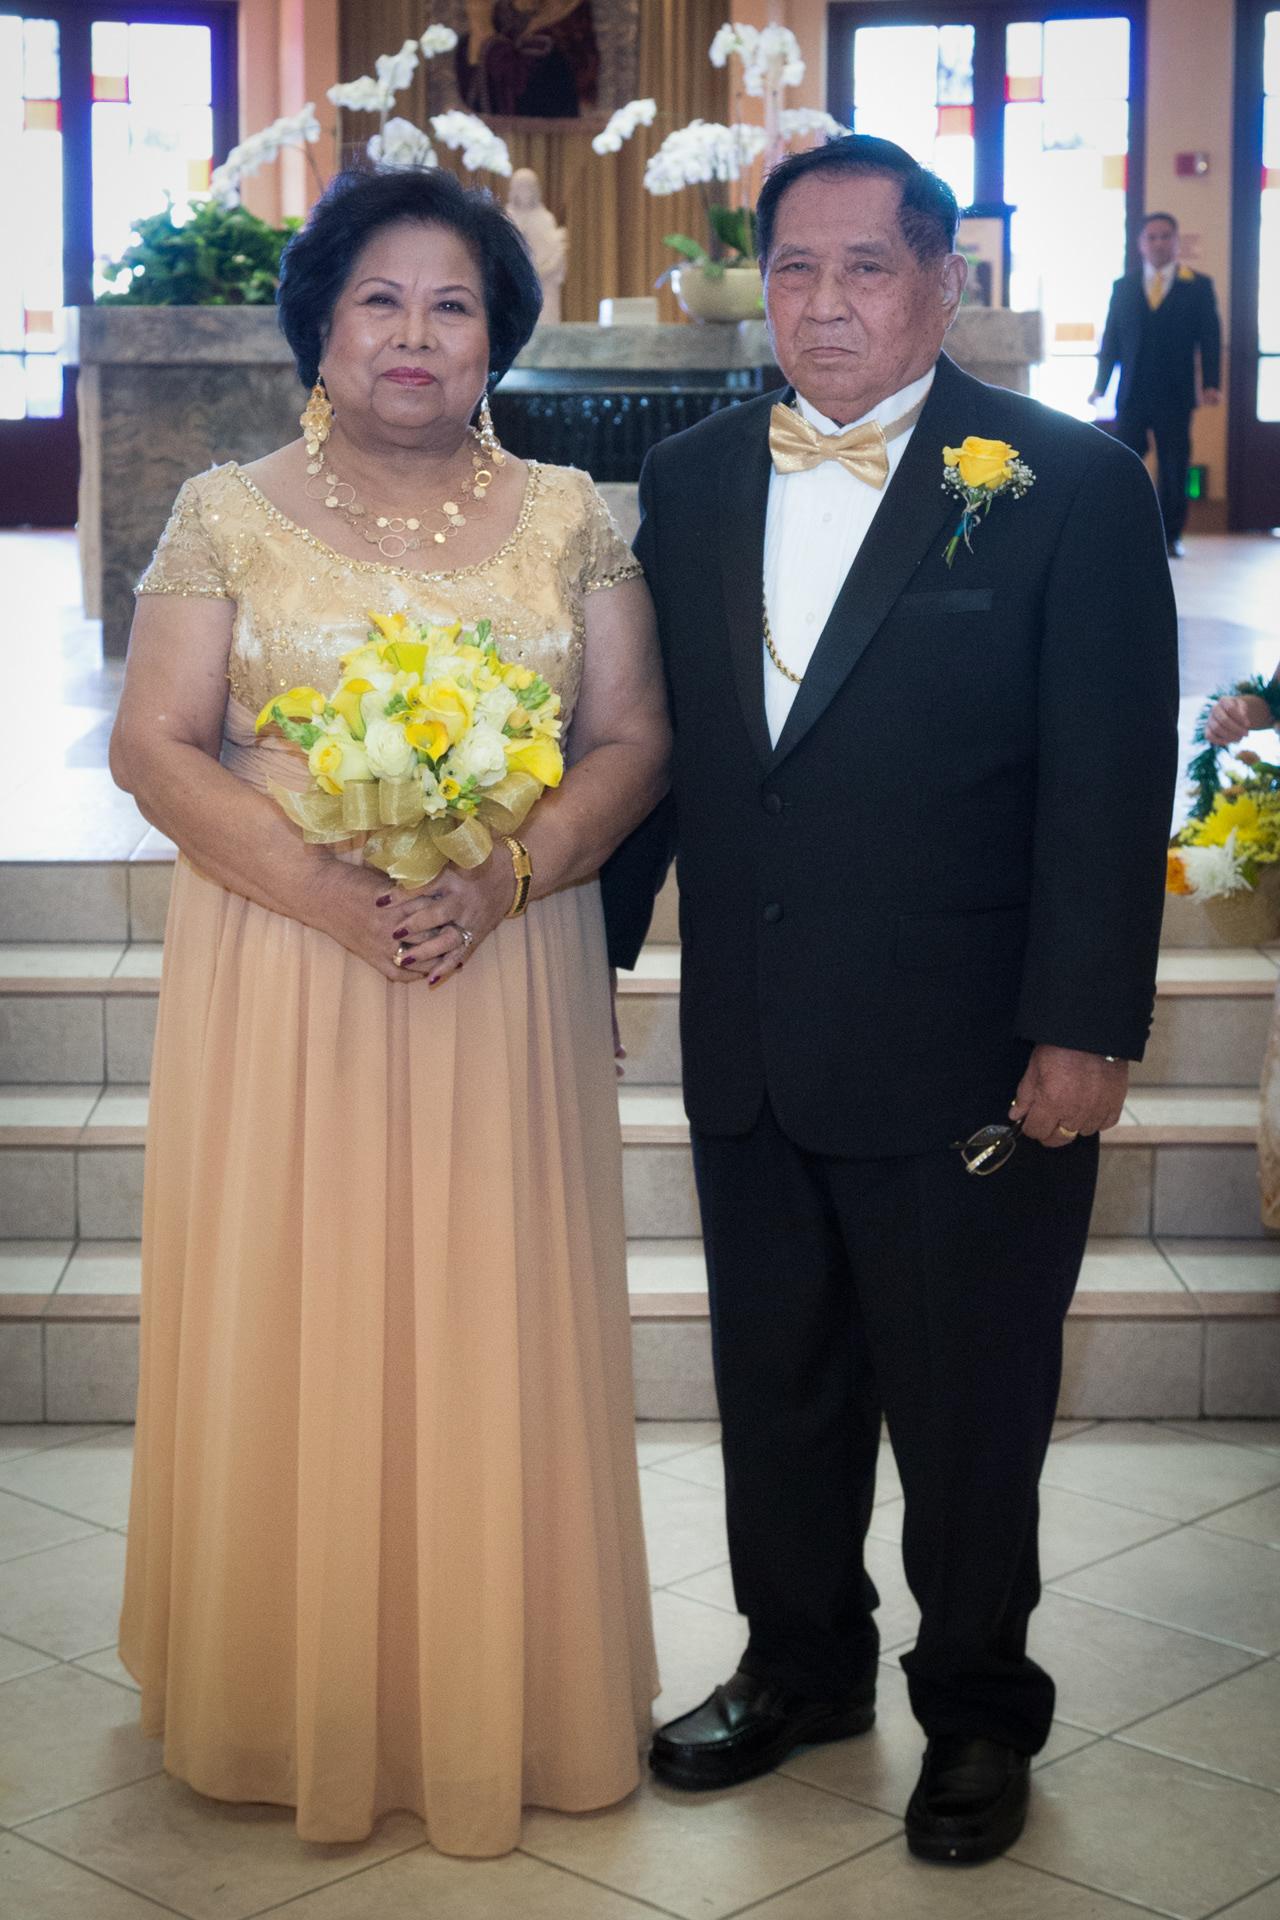 Anastacia Genaro Elguira 50th Wedding Anniversary April 23 2016 St Philomena Church Double Tree By Hilton Hotel